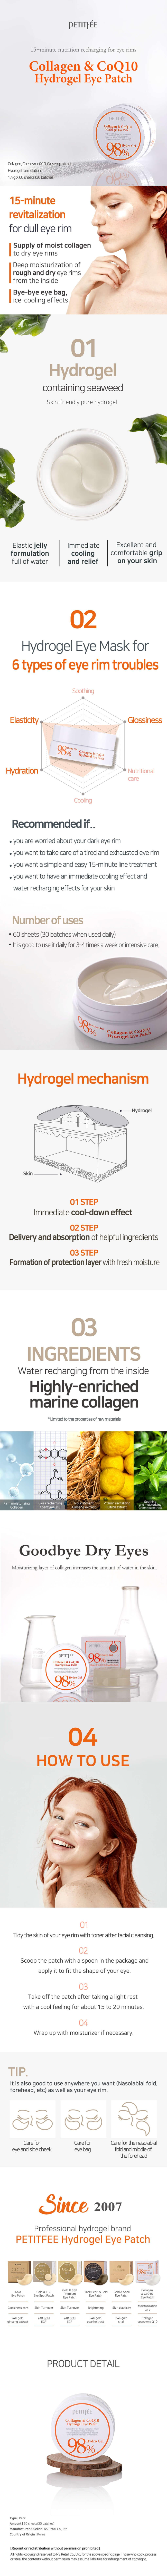 Petitfee 98% Collagen & CoQ10 Hydrogel Eye Patch 60 Sheets